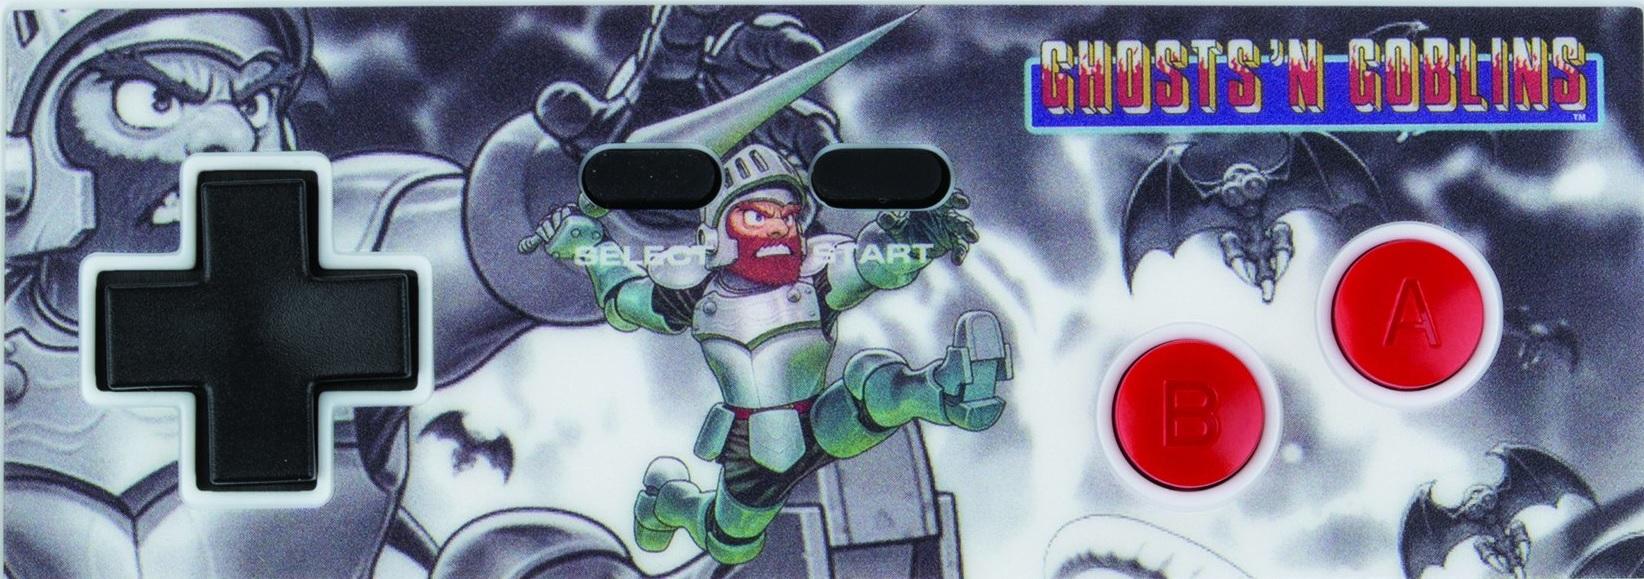 Review: Retro-Bit Dual Link NES Controllers screenshot